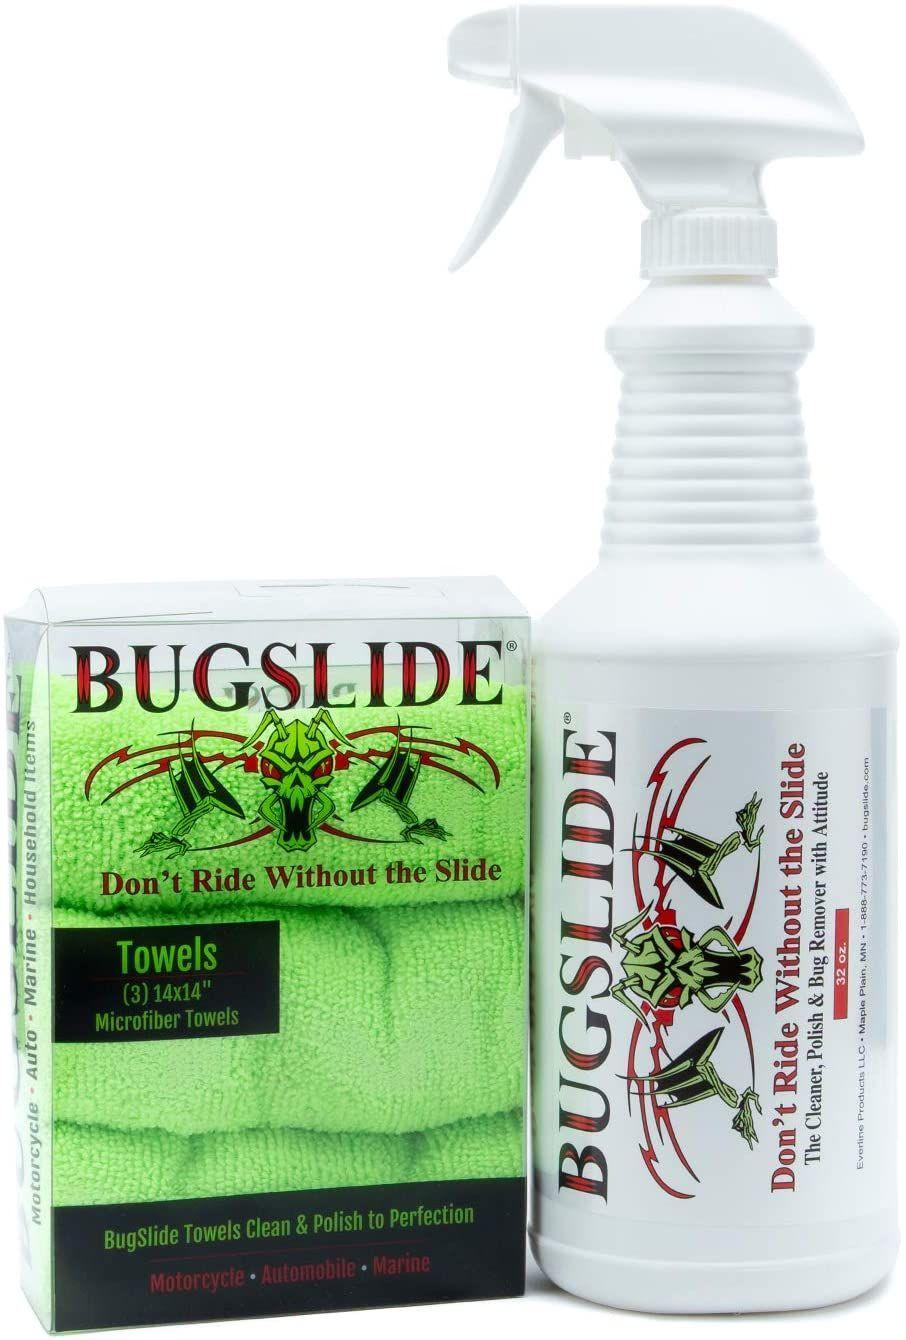 49 99 Best Bugslide Easy Application Clean And Polish Spray Kit Microfiber Towel Spray Bottle Hand Soap Bottle